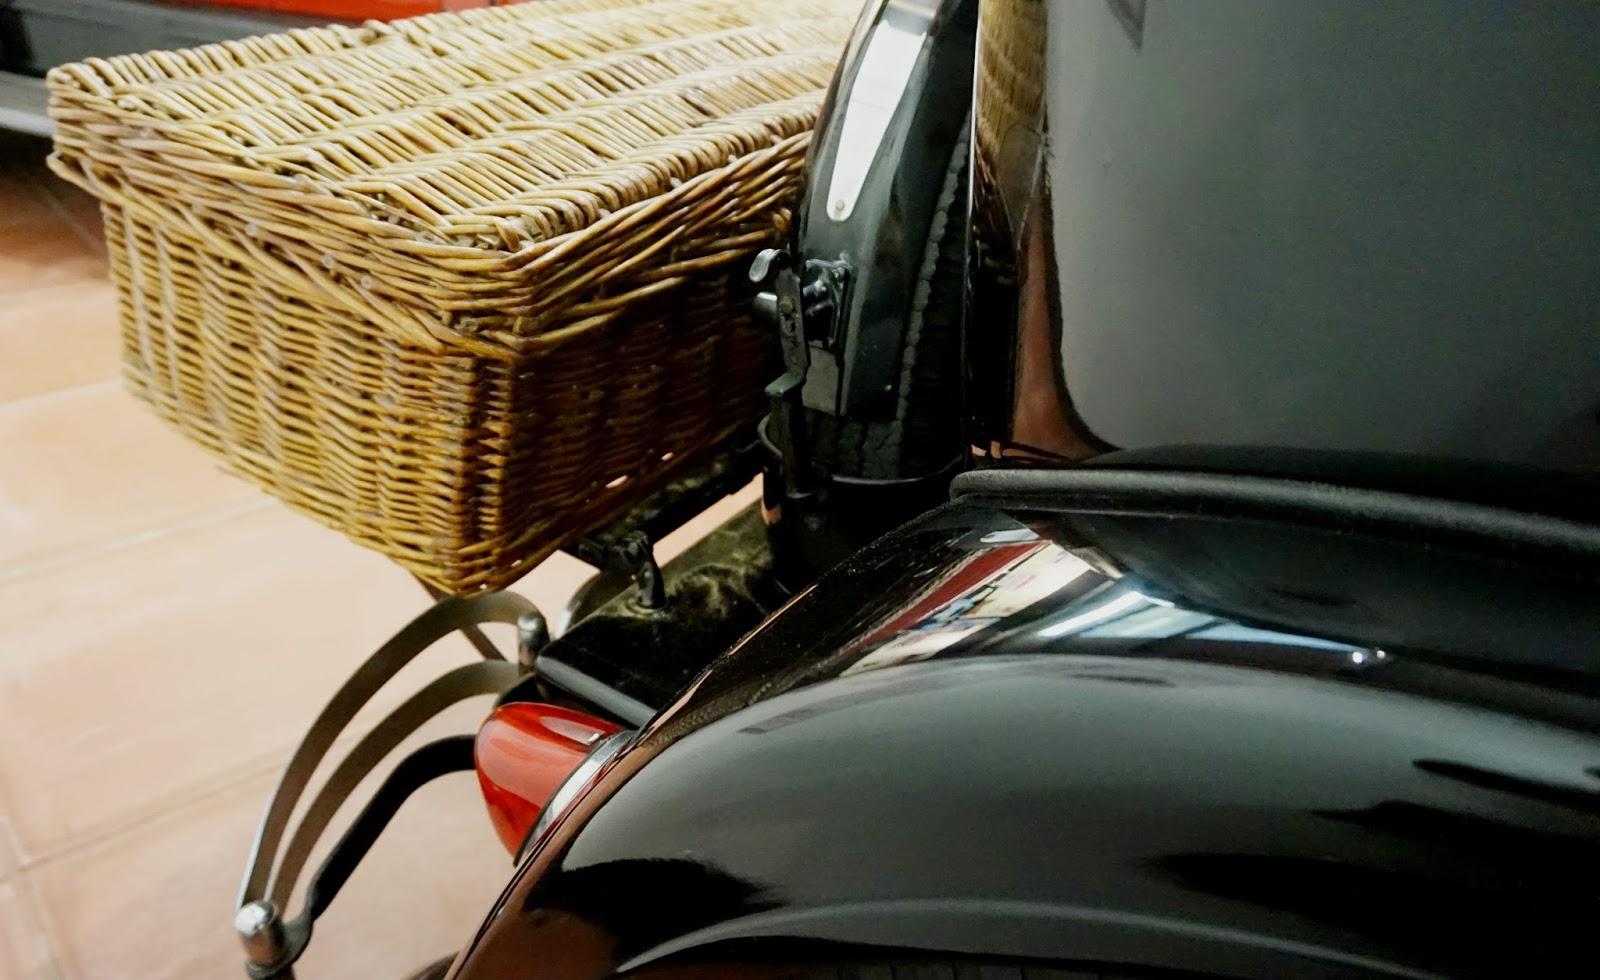 classic black car nostalgic wicker basket picnic haynes motor museum